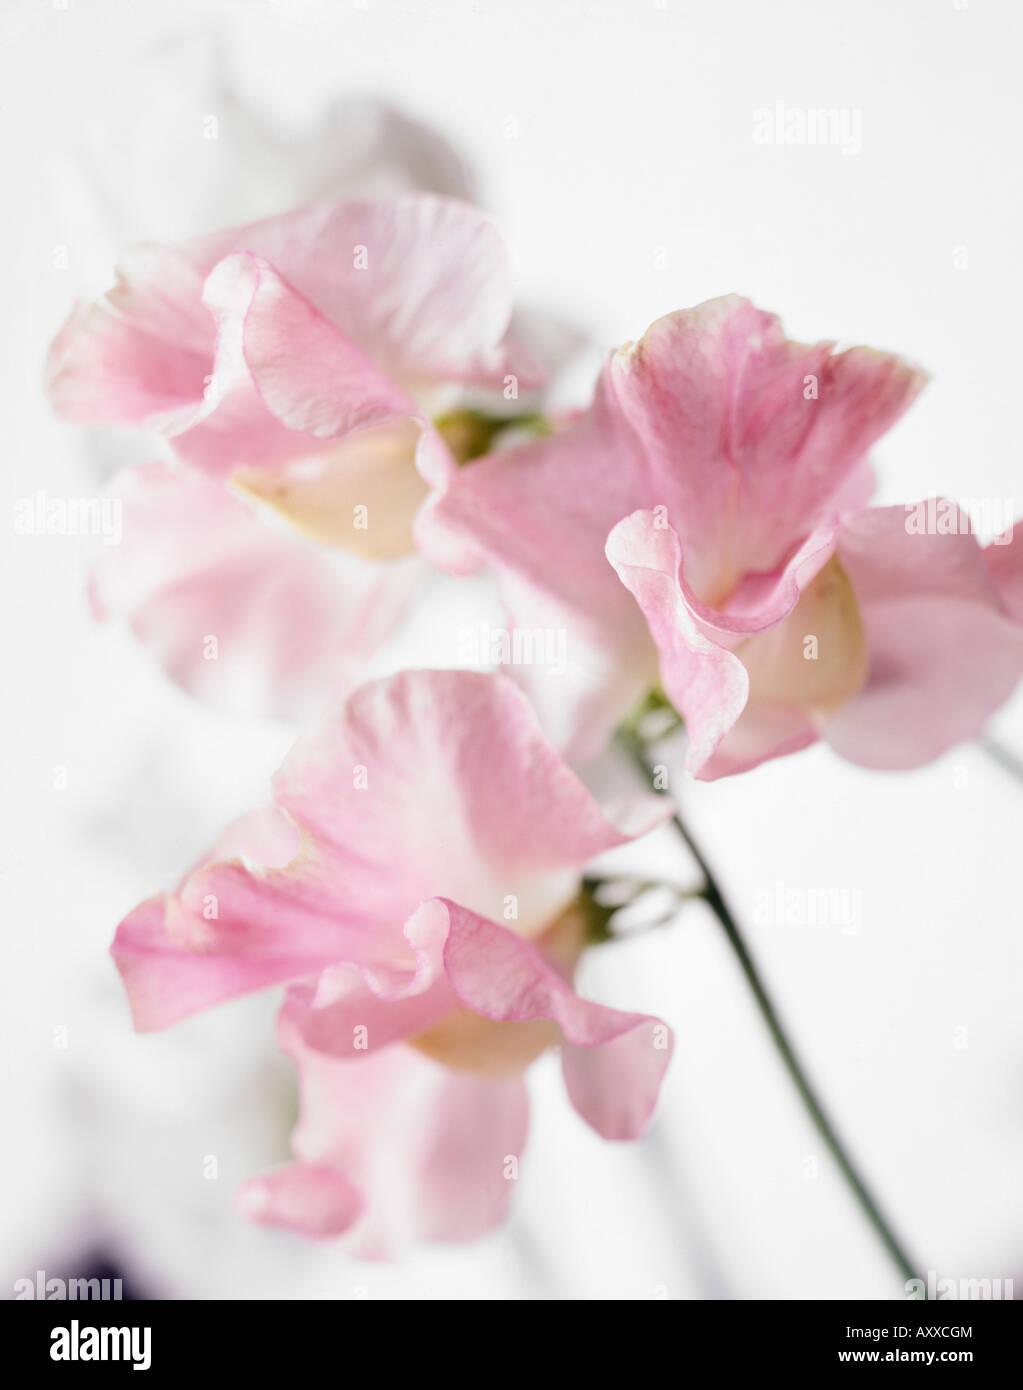 Sweet Pea Sweetpea Lathyrus Odoratus Pink Flowers